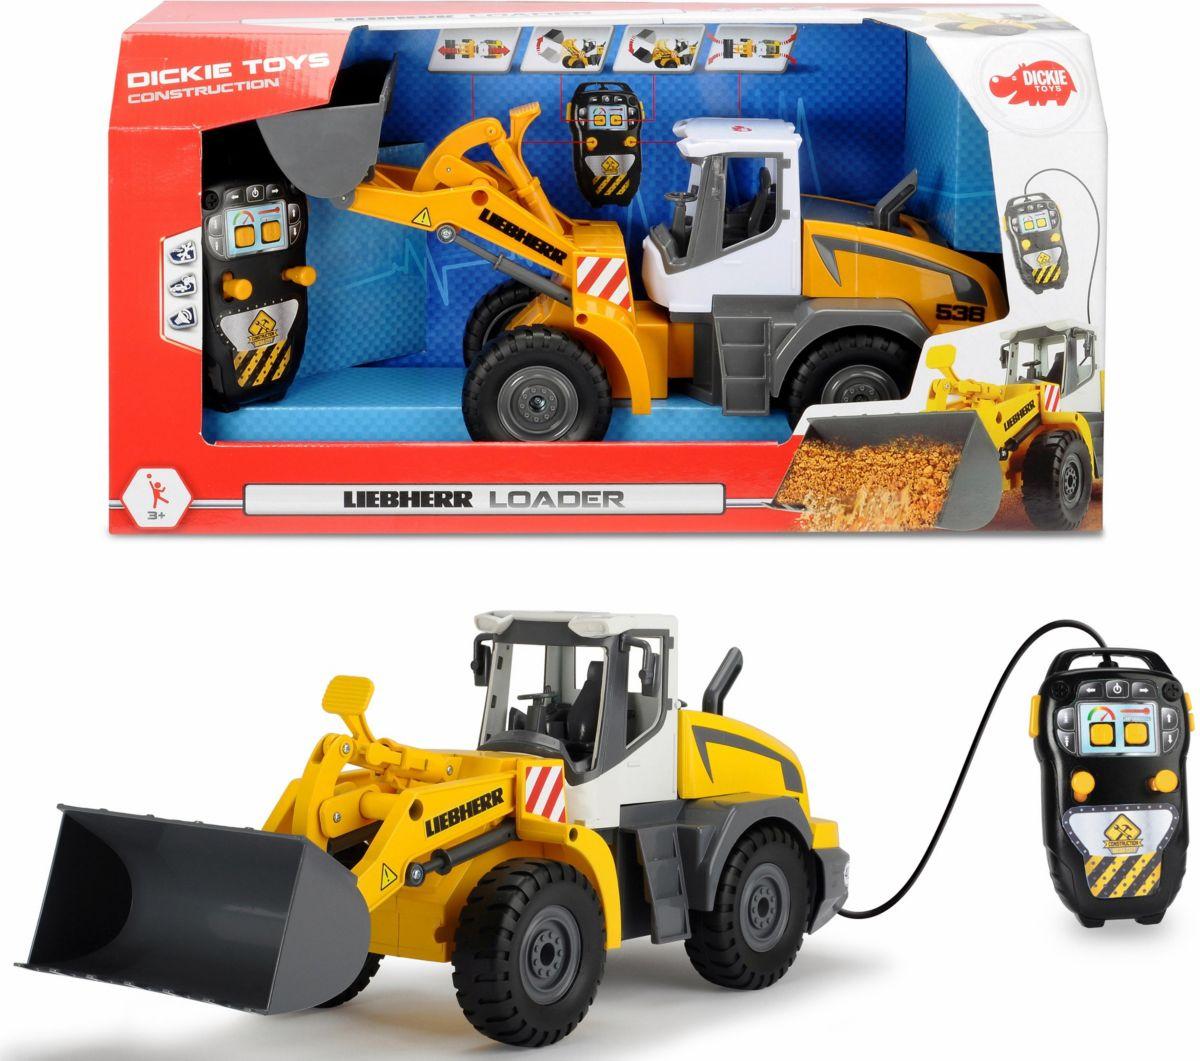 Dickie Toys Spielzeug Radlader motorisiert, »Li...